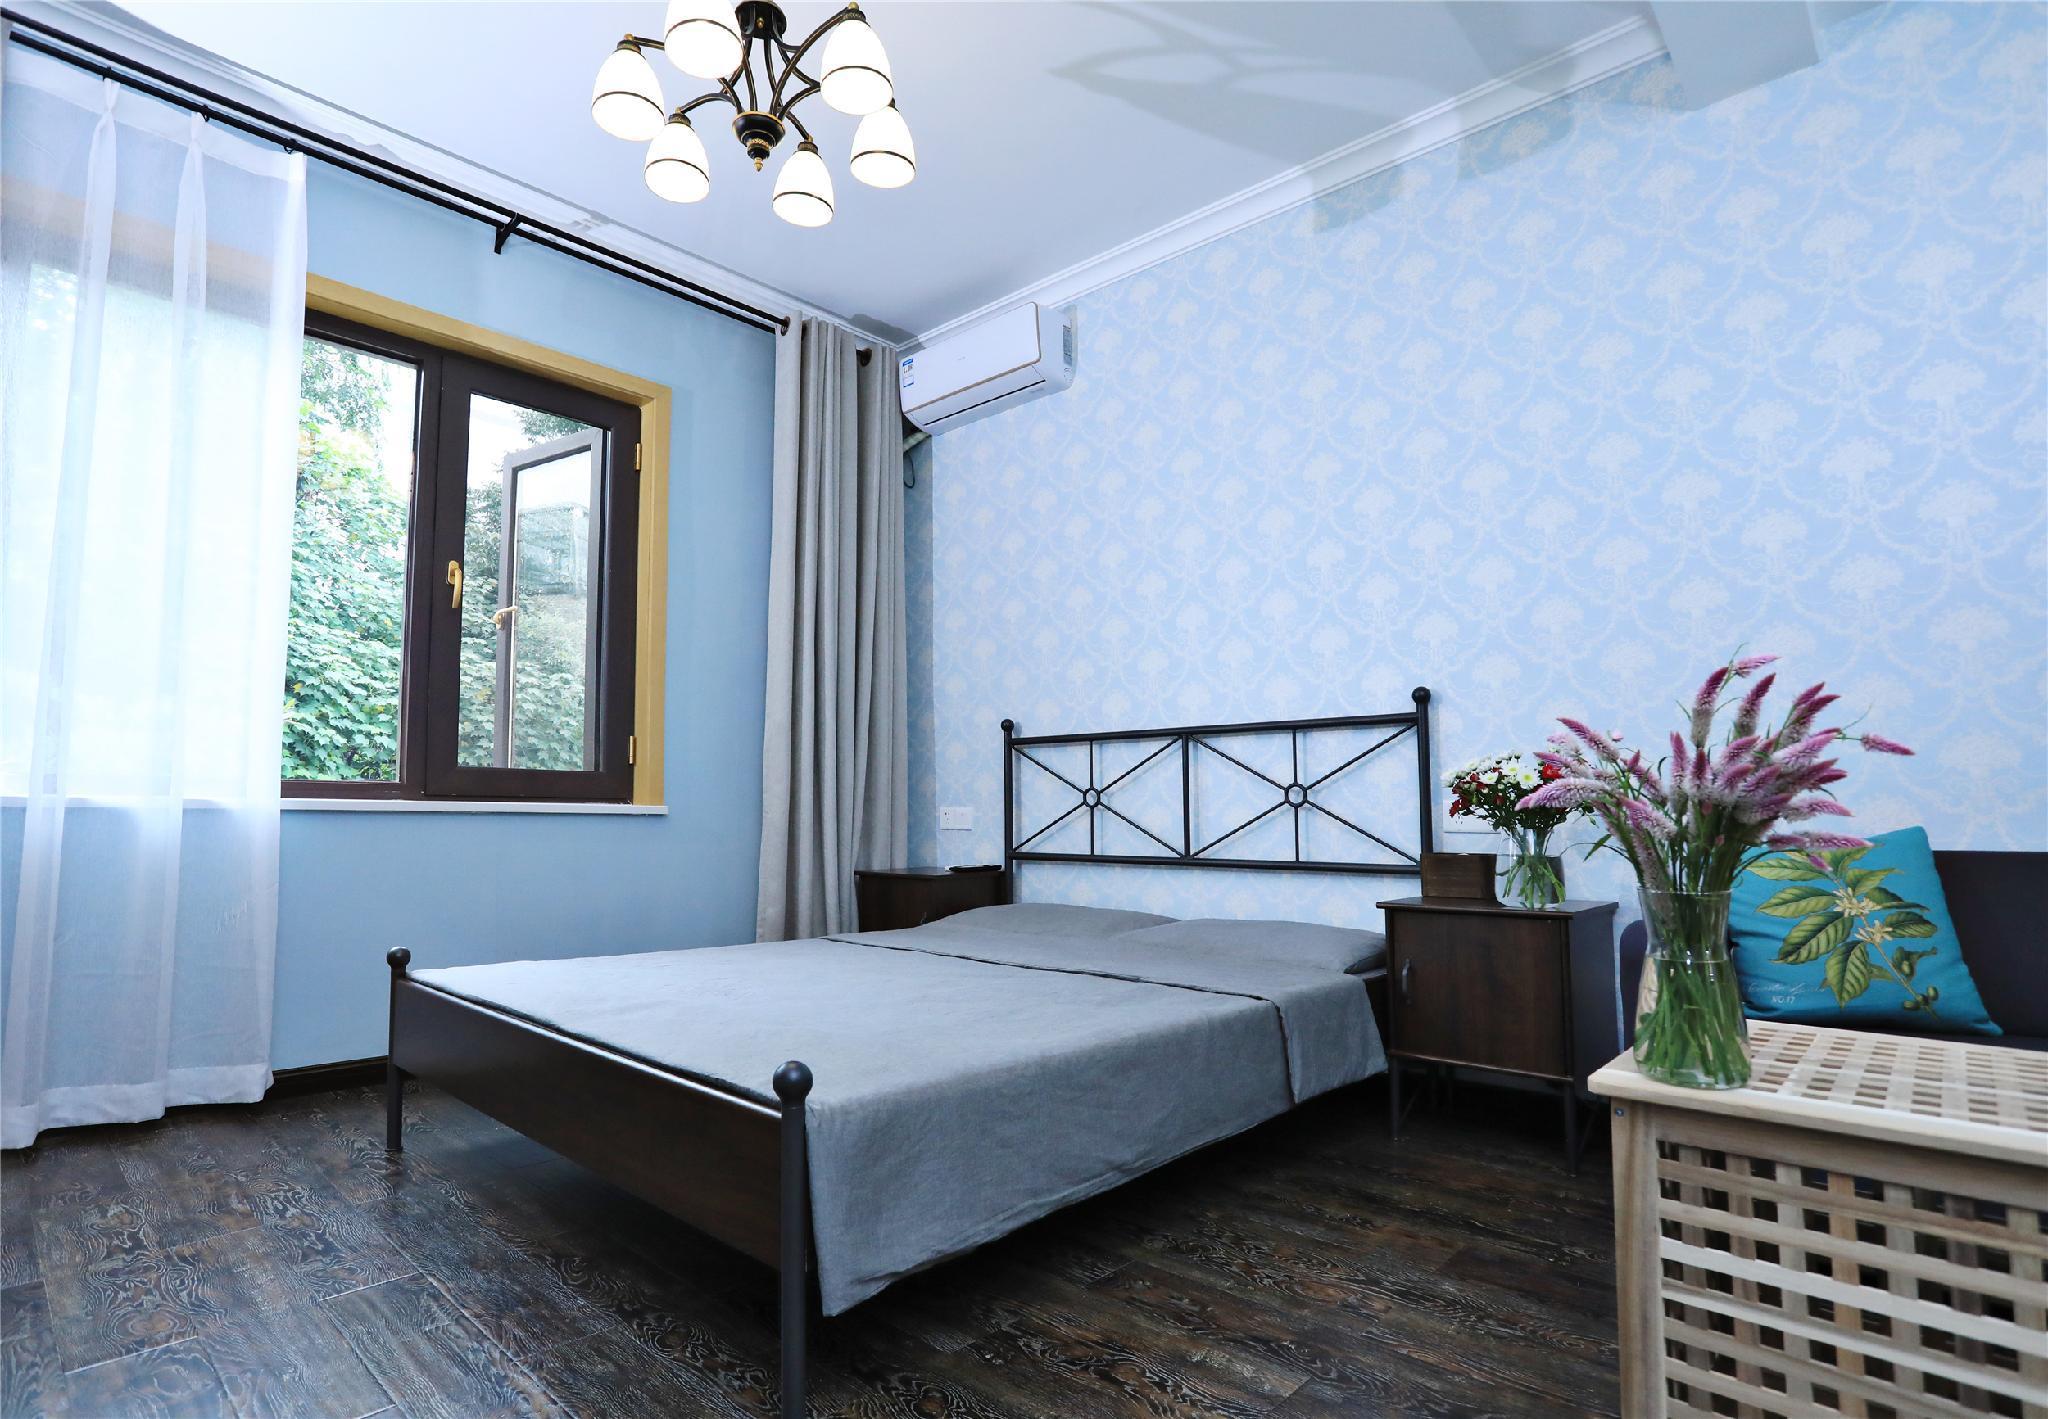 Cozy European Family Room C With Floor Heating